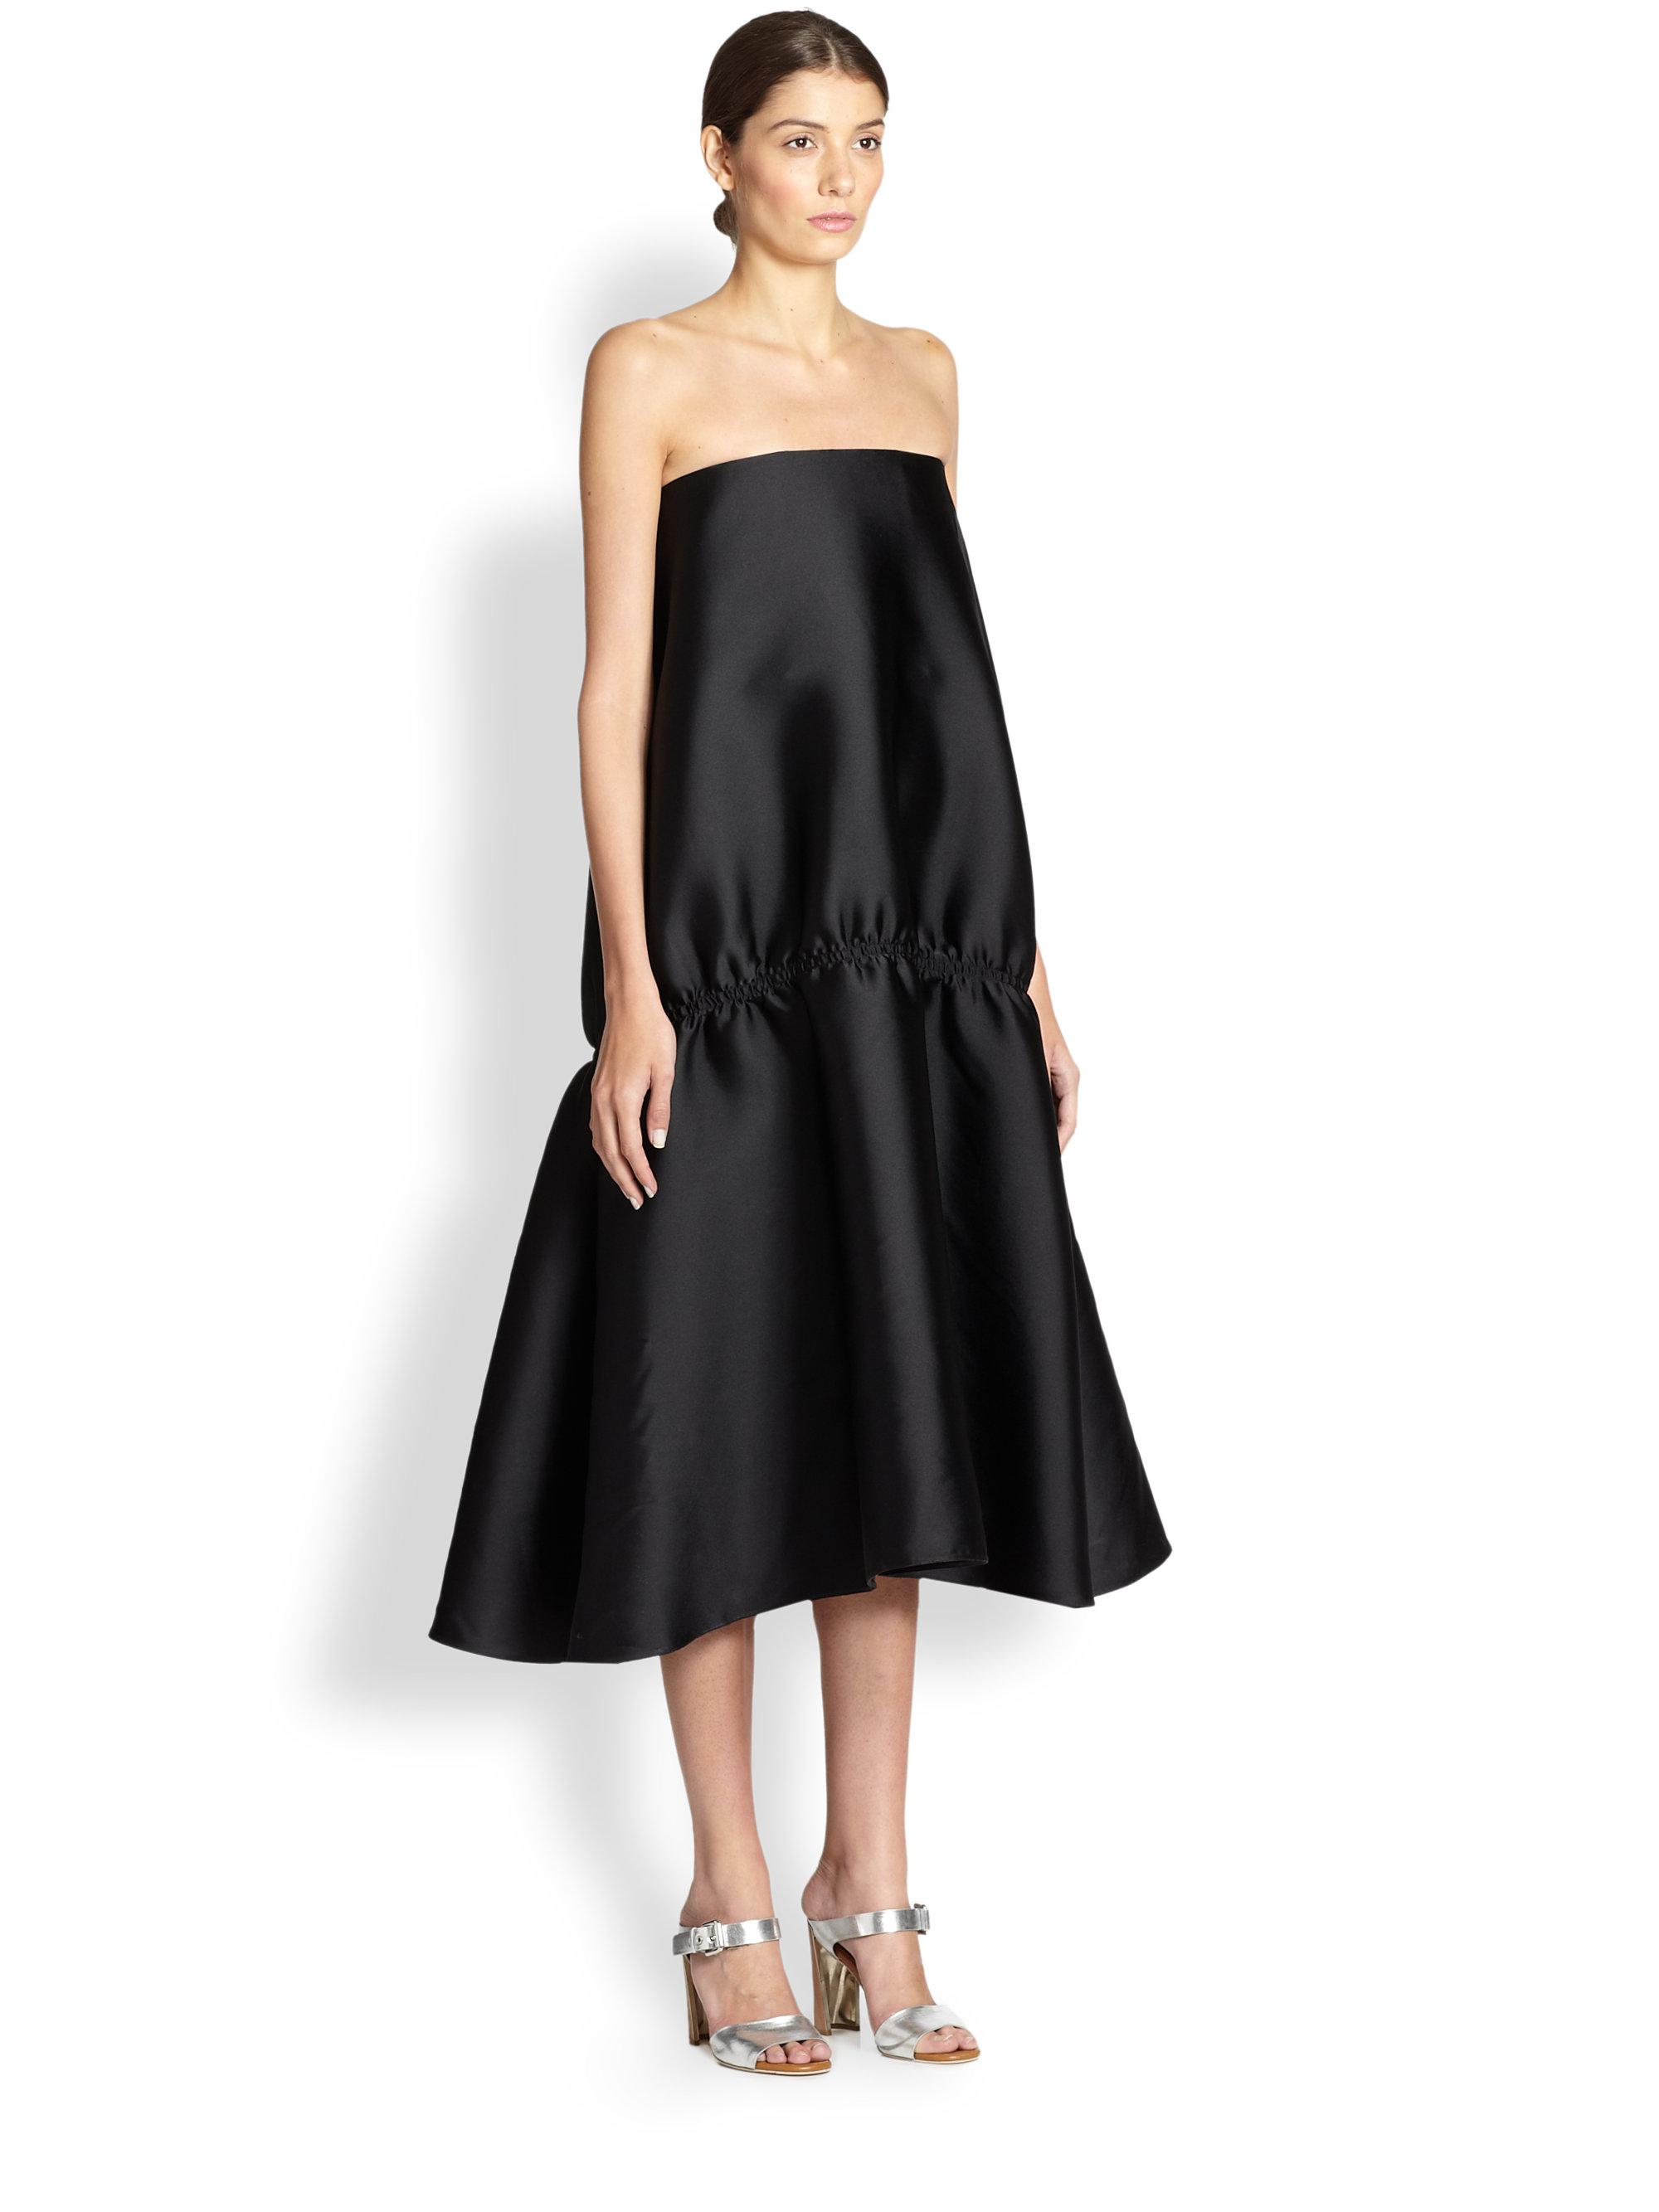 Stella Mccartney Strap less Flounce-hem Evening Dress in Black - Lyst